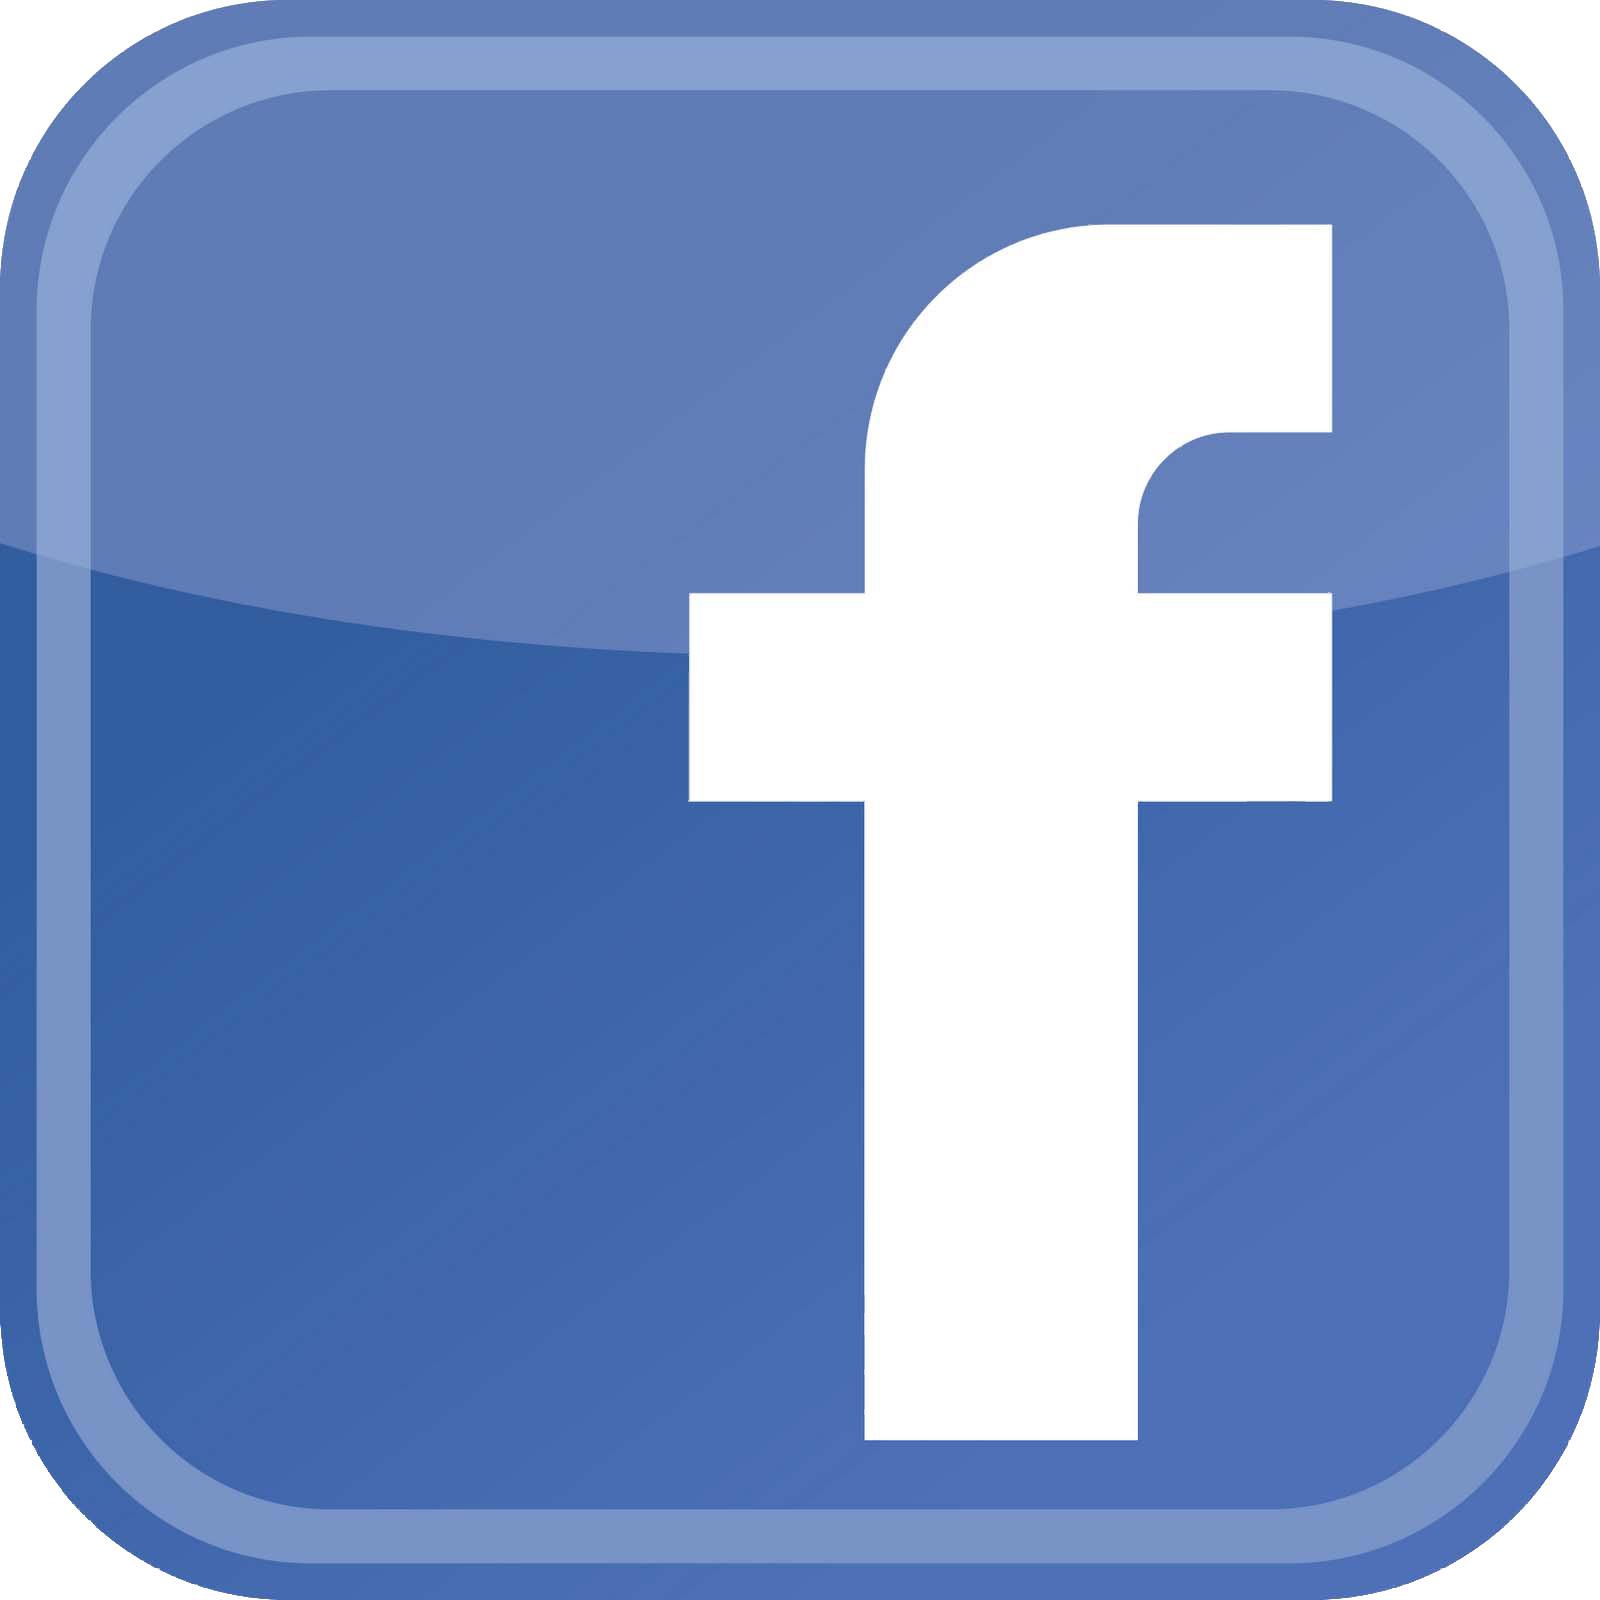 Facebook shortcut clipart clip freeuse Facebook shortcut clipart - ClipartFest clip freeuse